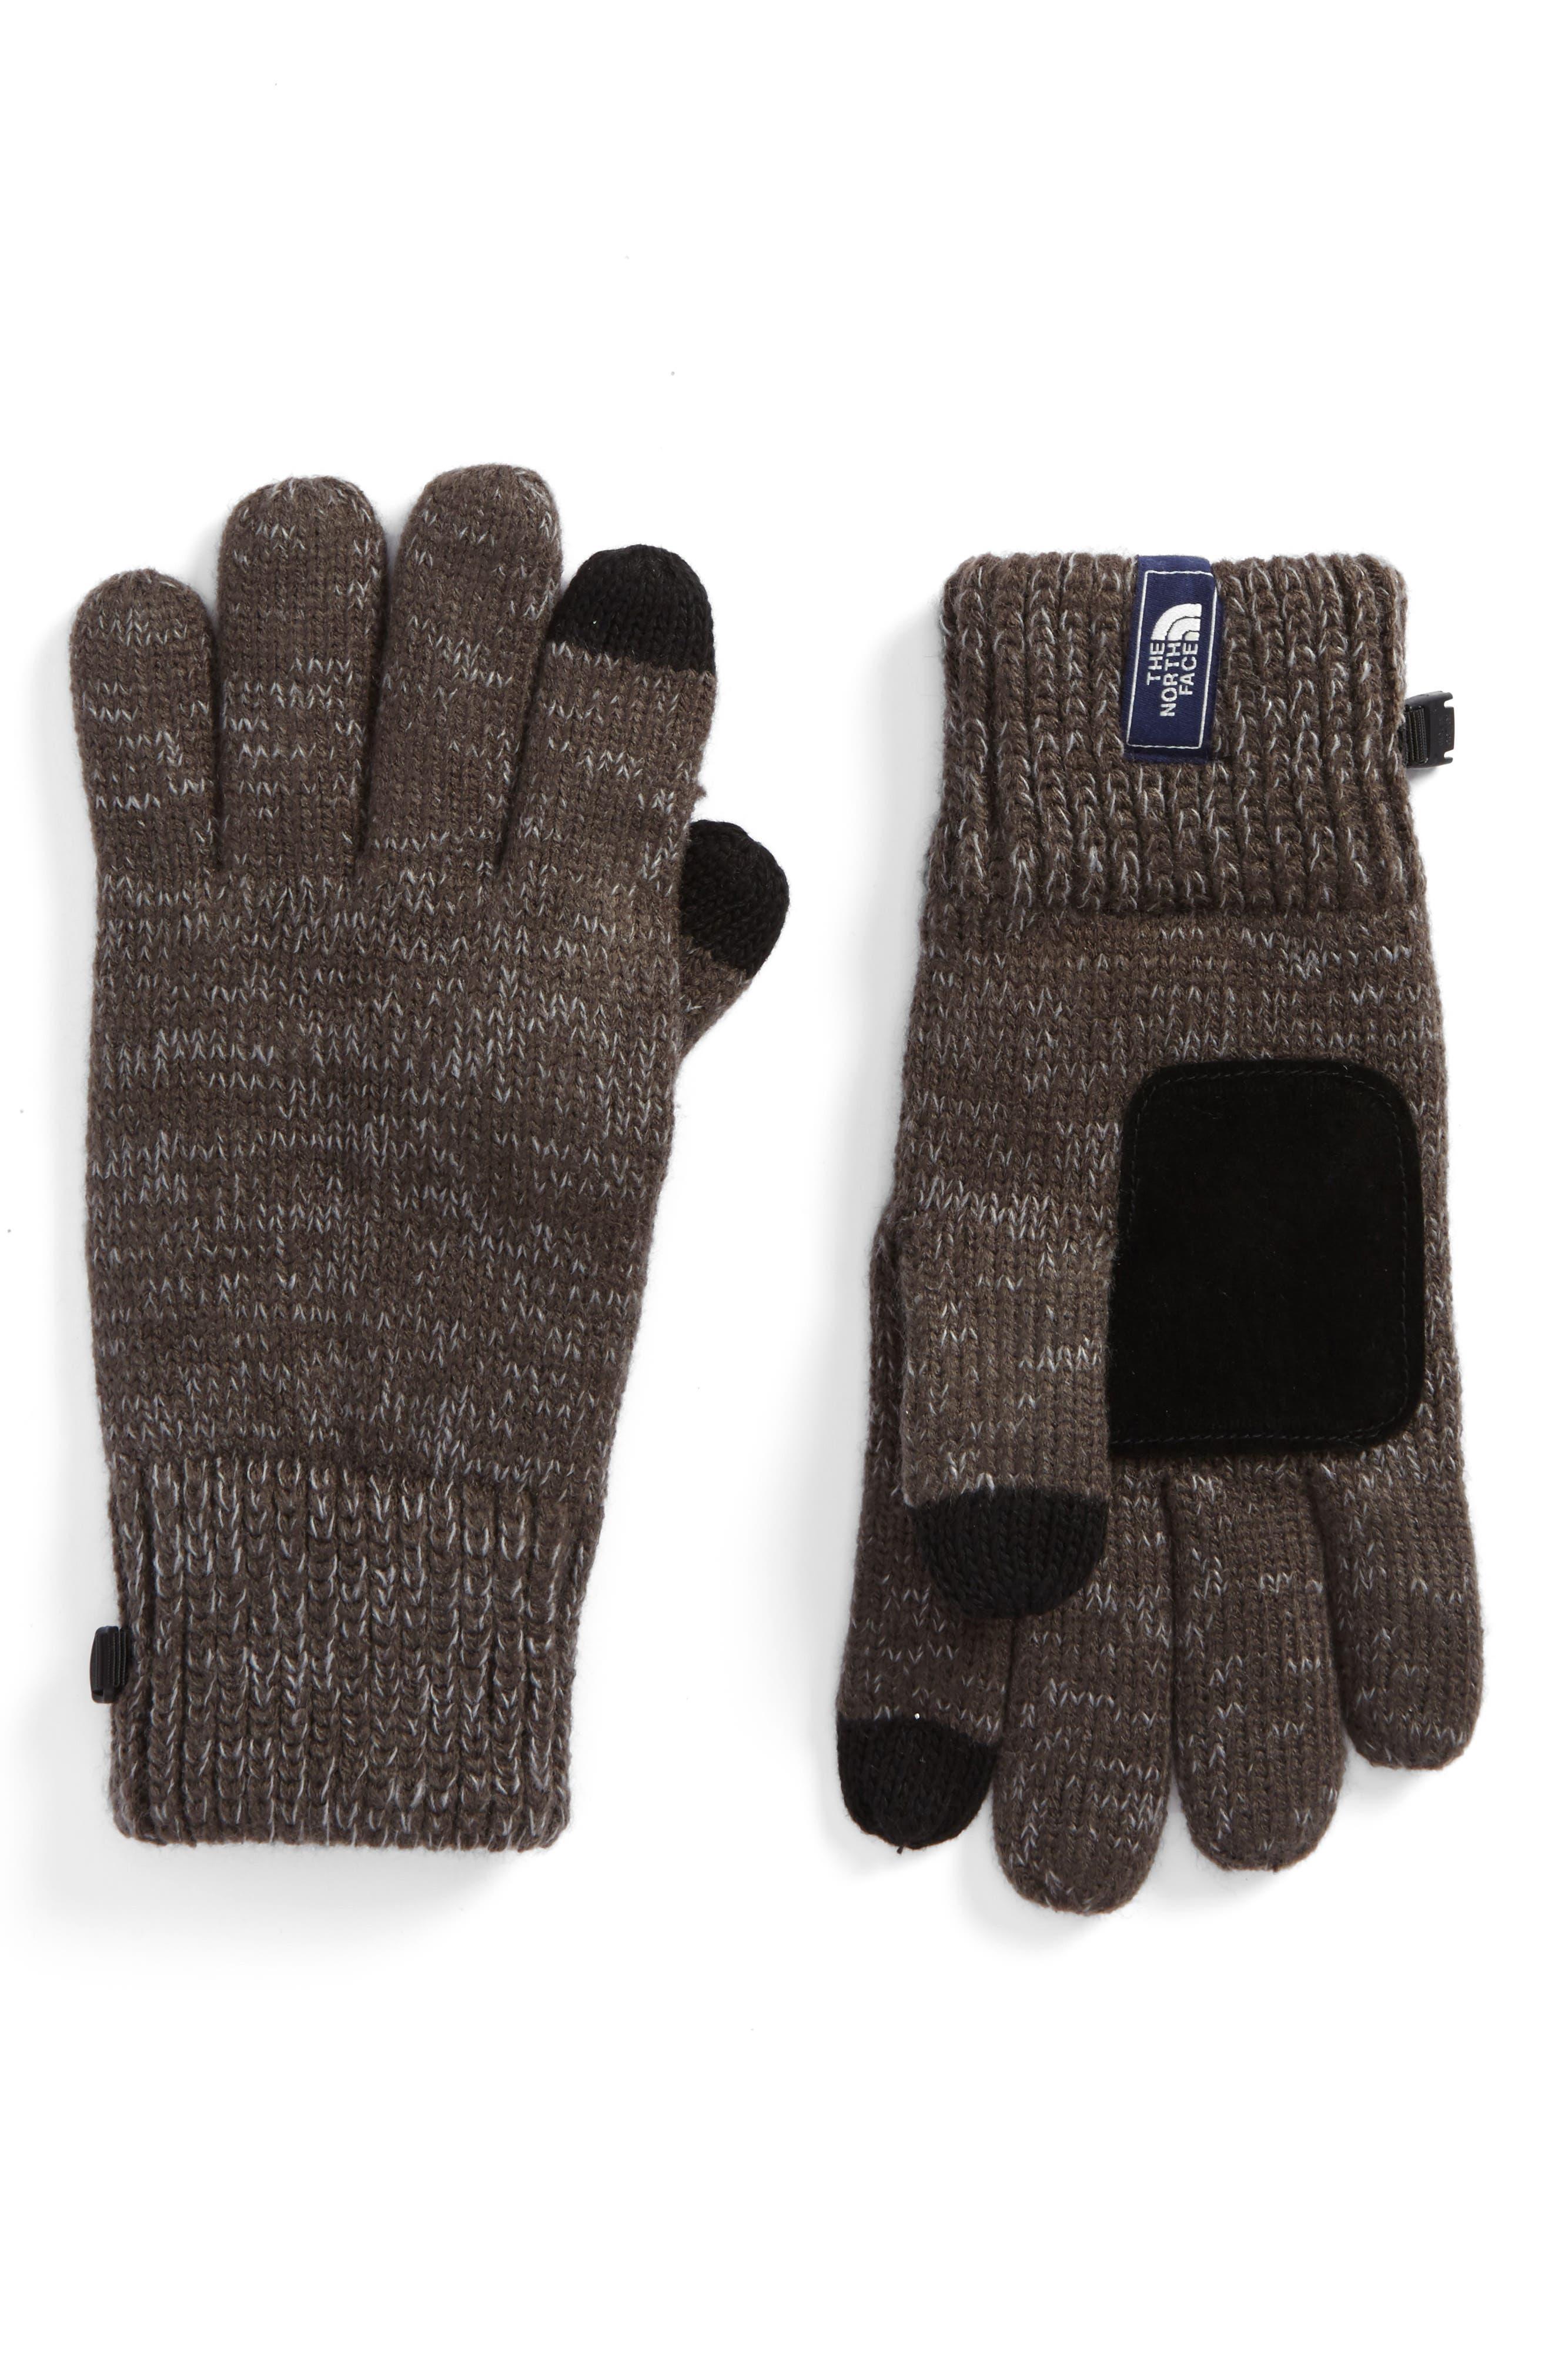 Etip Salty Dog Knit Tech Gloves,                             Main thumbnail 1, color,                             GRAPHITE GREY/ MID GREY MARL